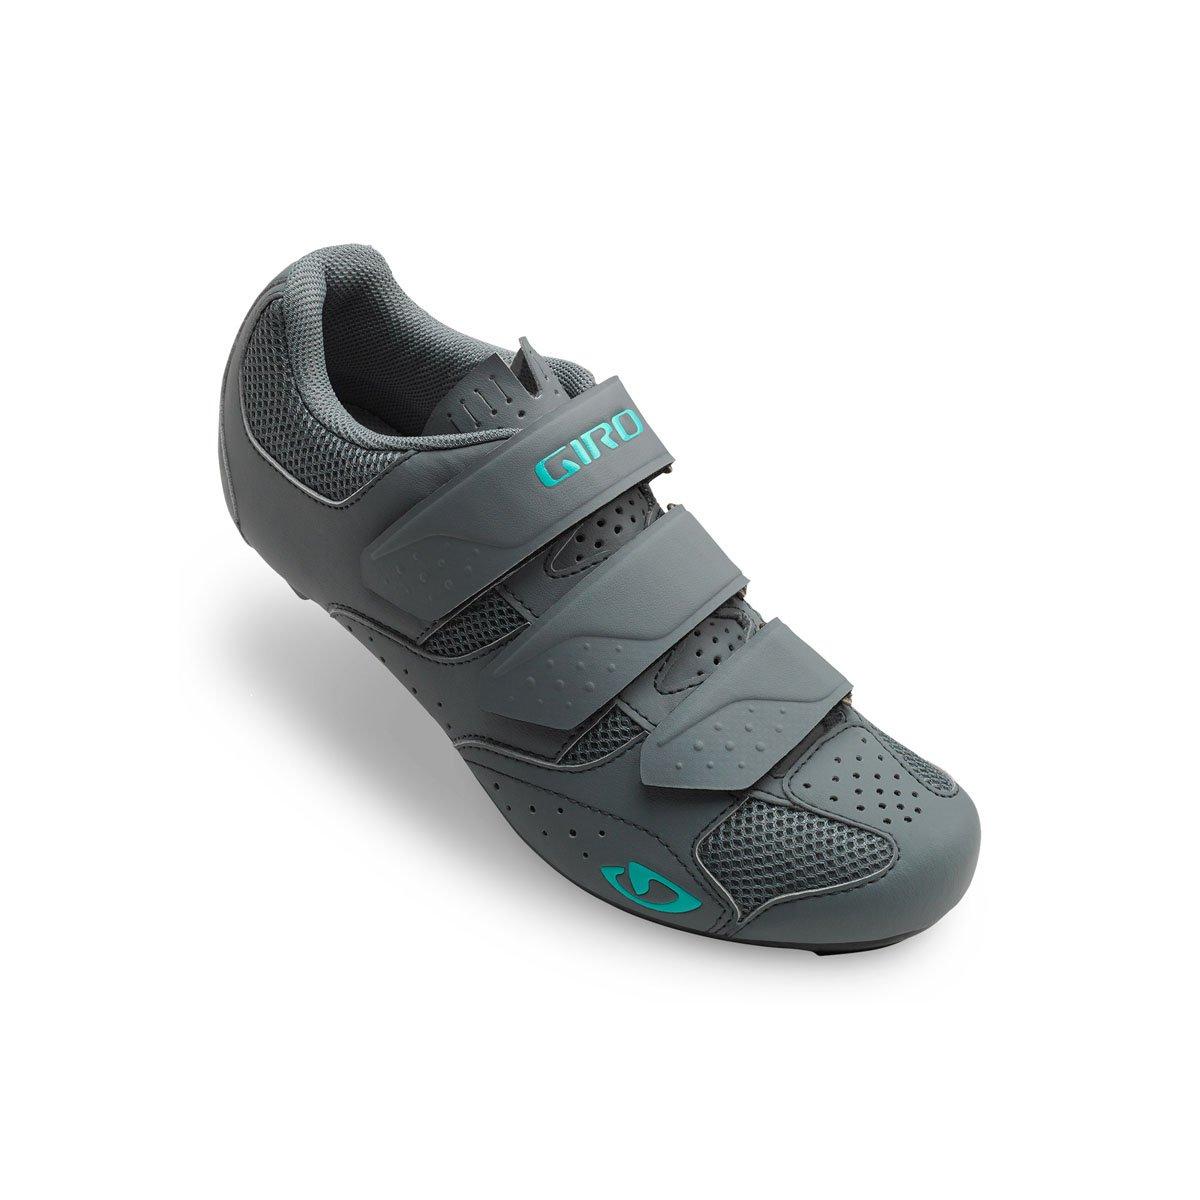 Giro B075RS3PT3 GF22175 Women's Techne Shoe B075RS3PT3 Giro 41|Titanium/Glacier 190a54